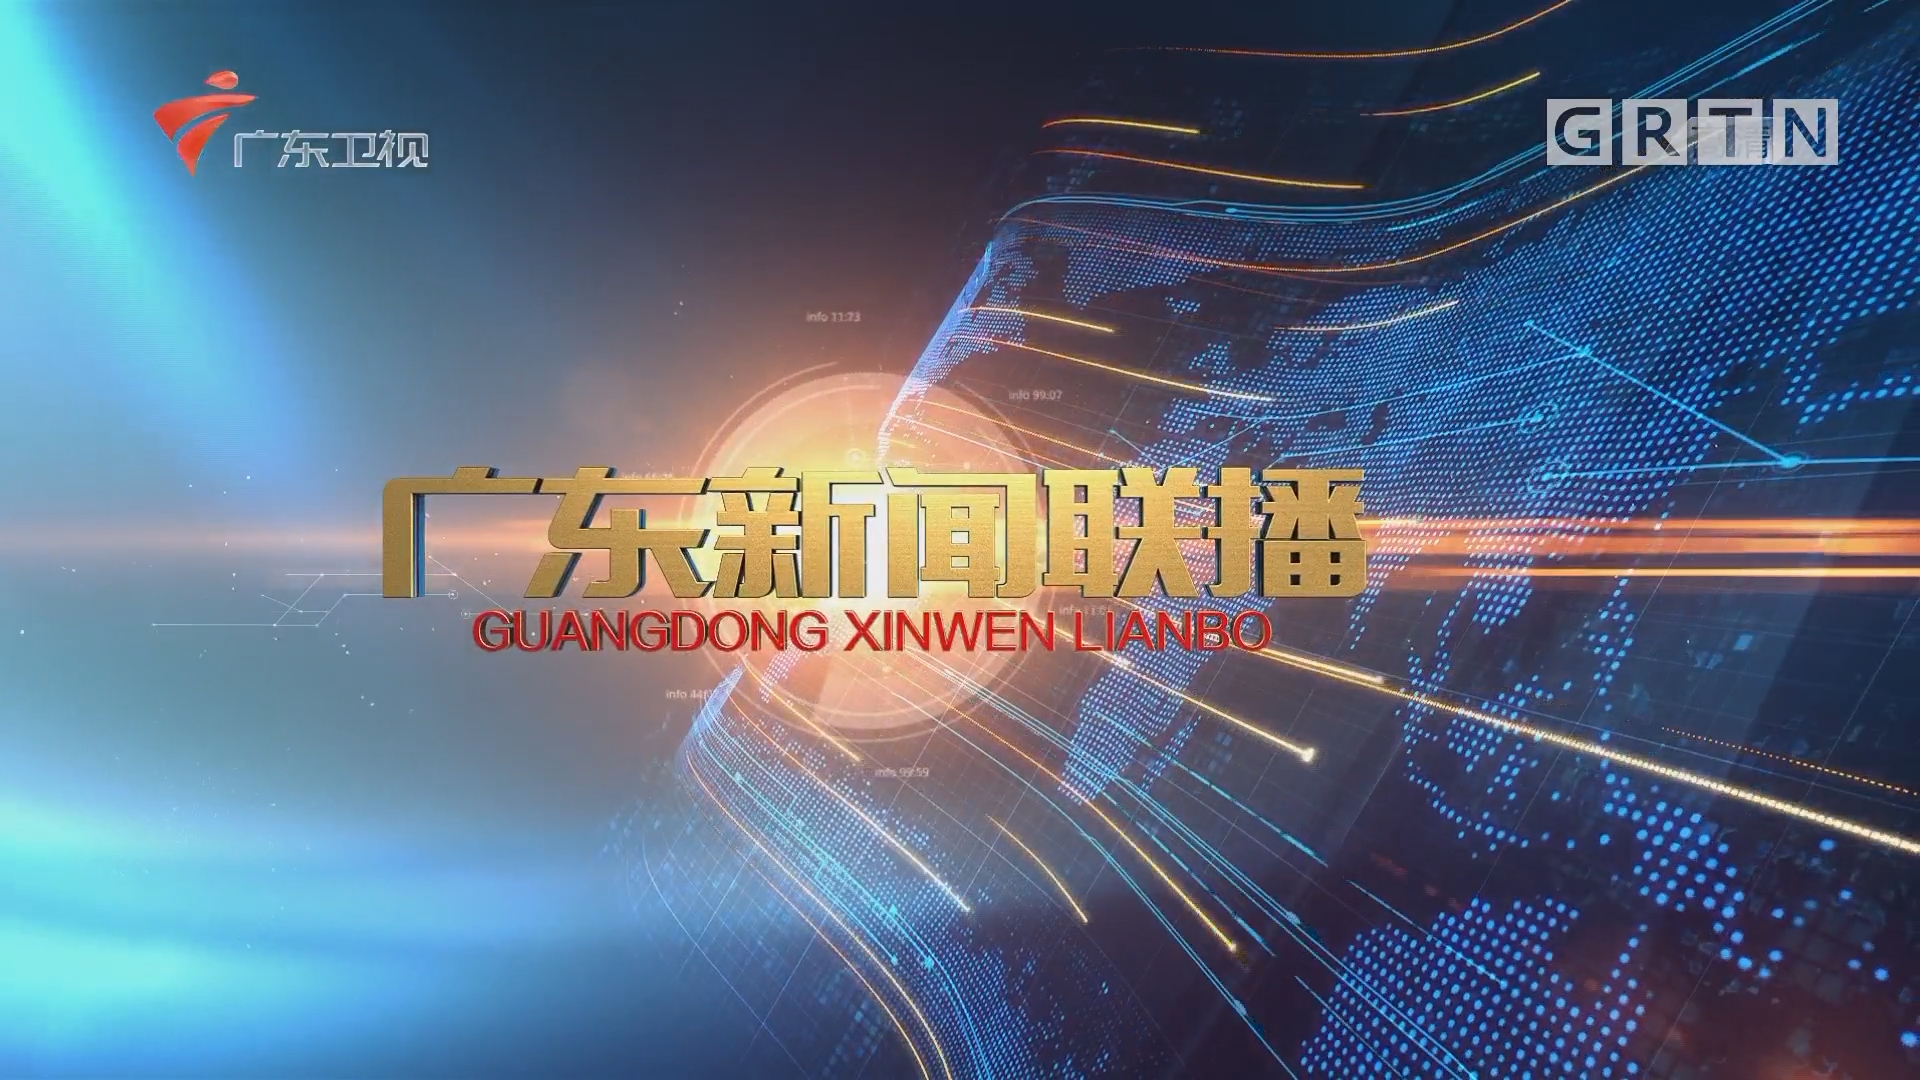 [HD][2019-03-26]广东新闻联播:深圳:加速推进大空港建设 临空经济助力新发展